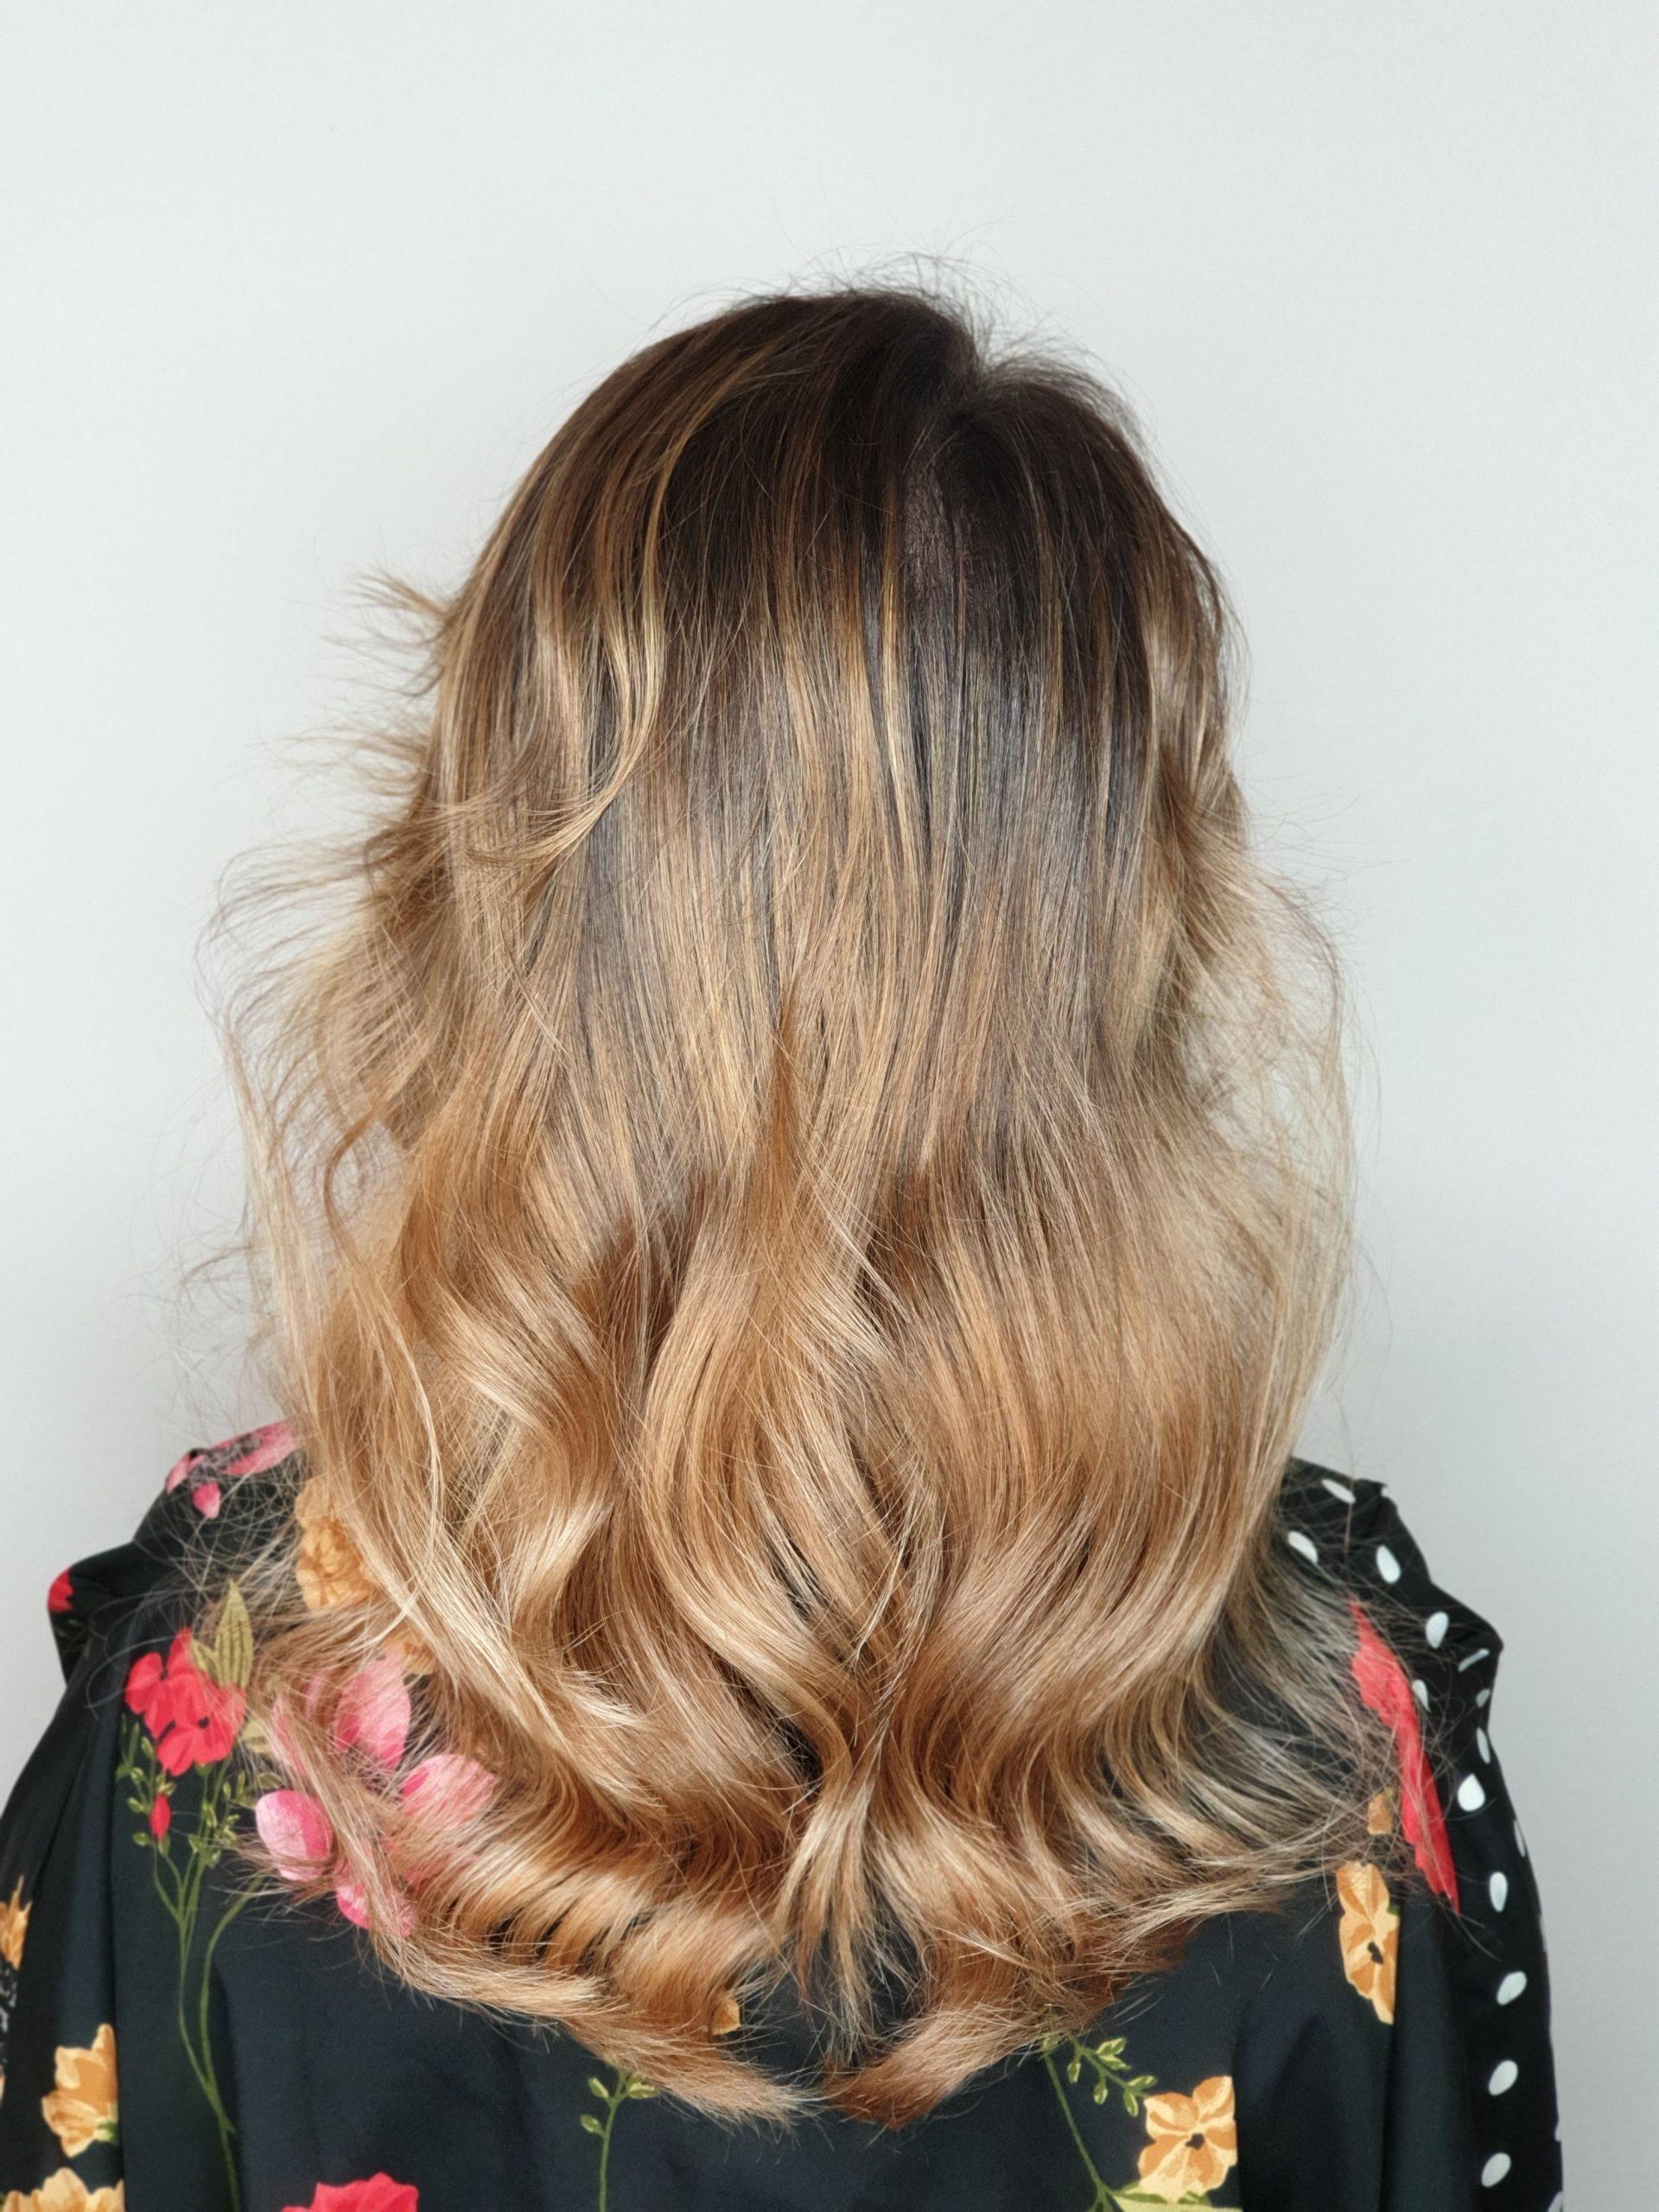 balayage cu efect de sombre pe blond natural